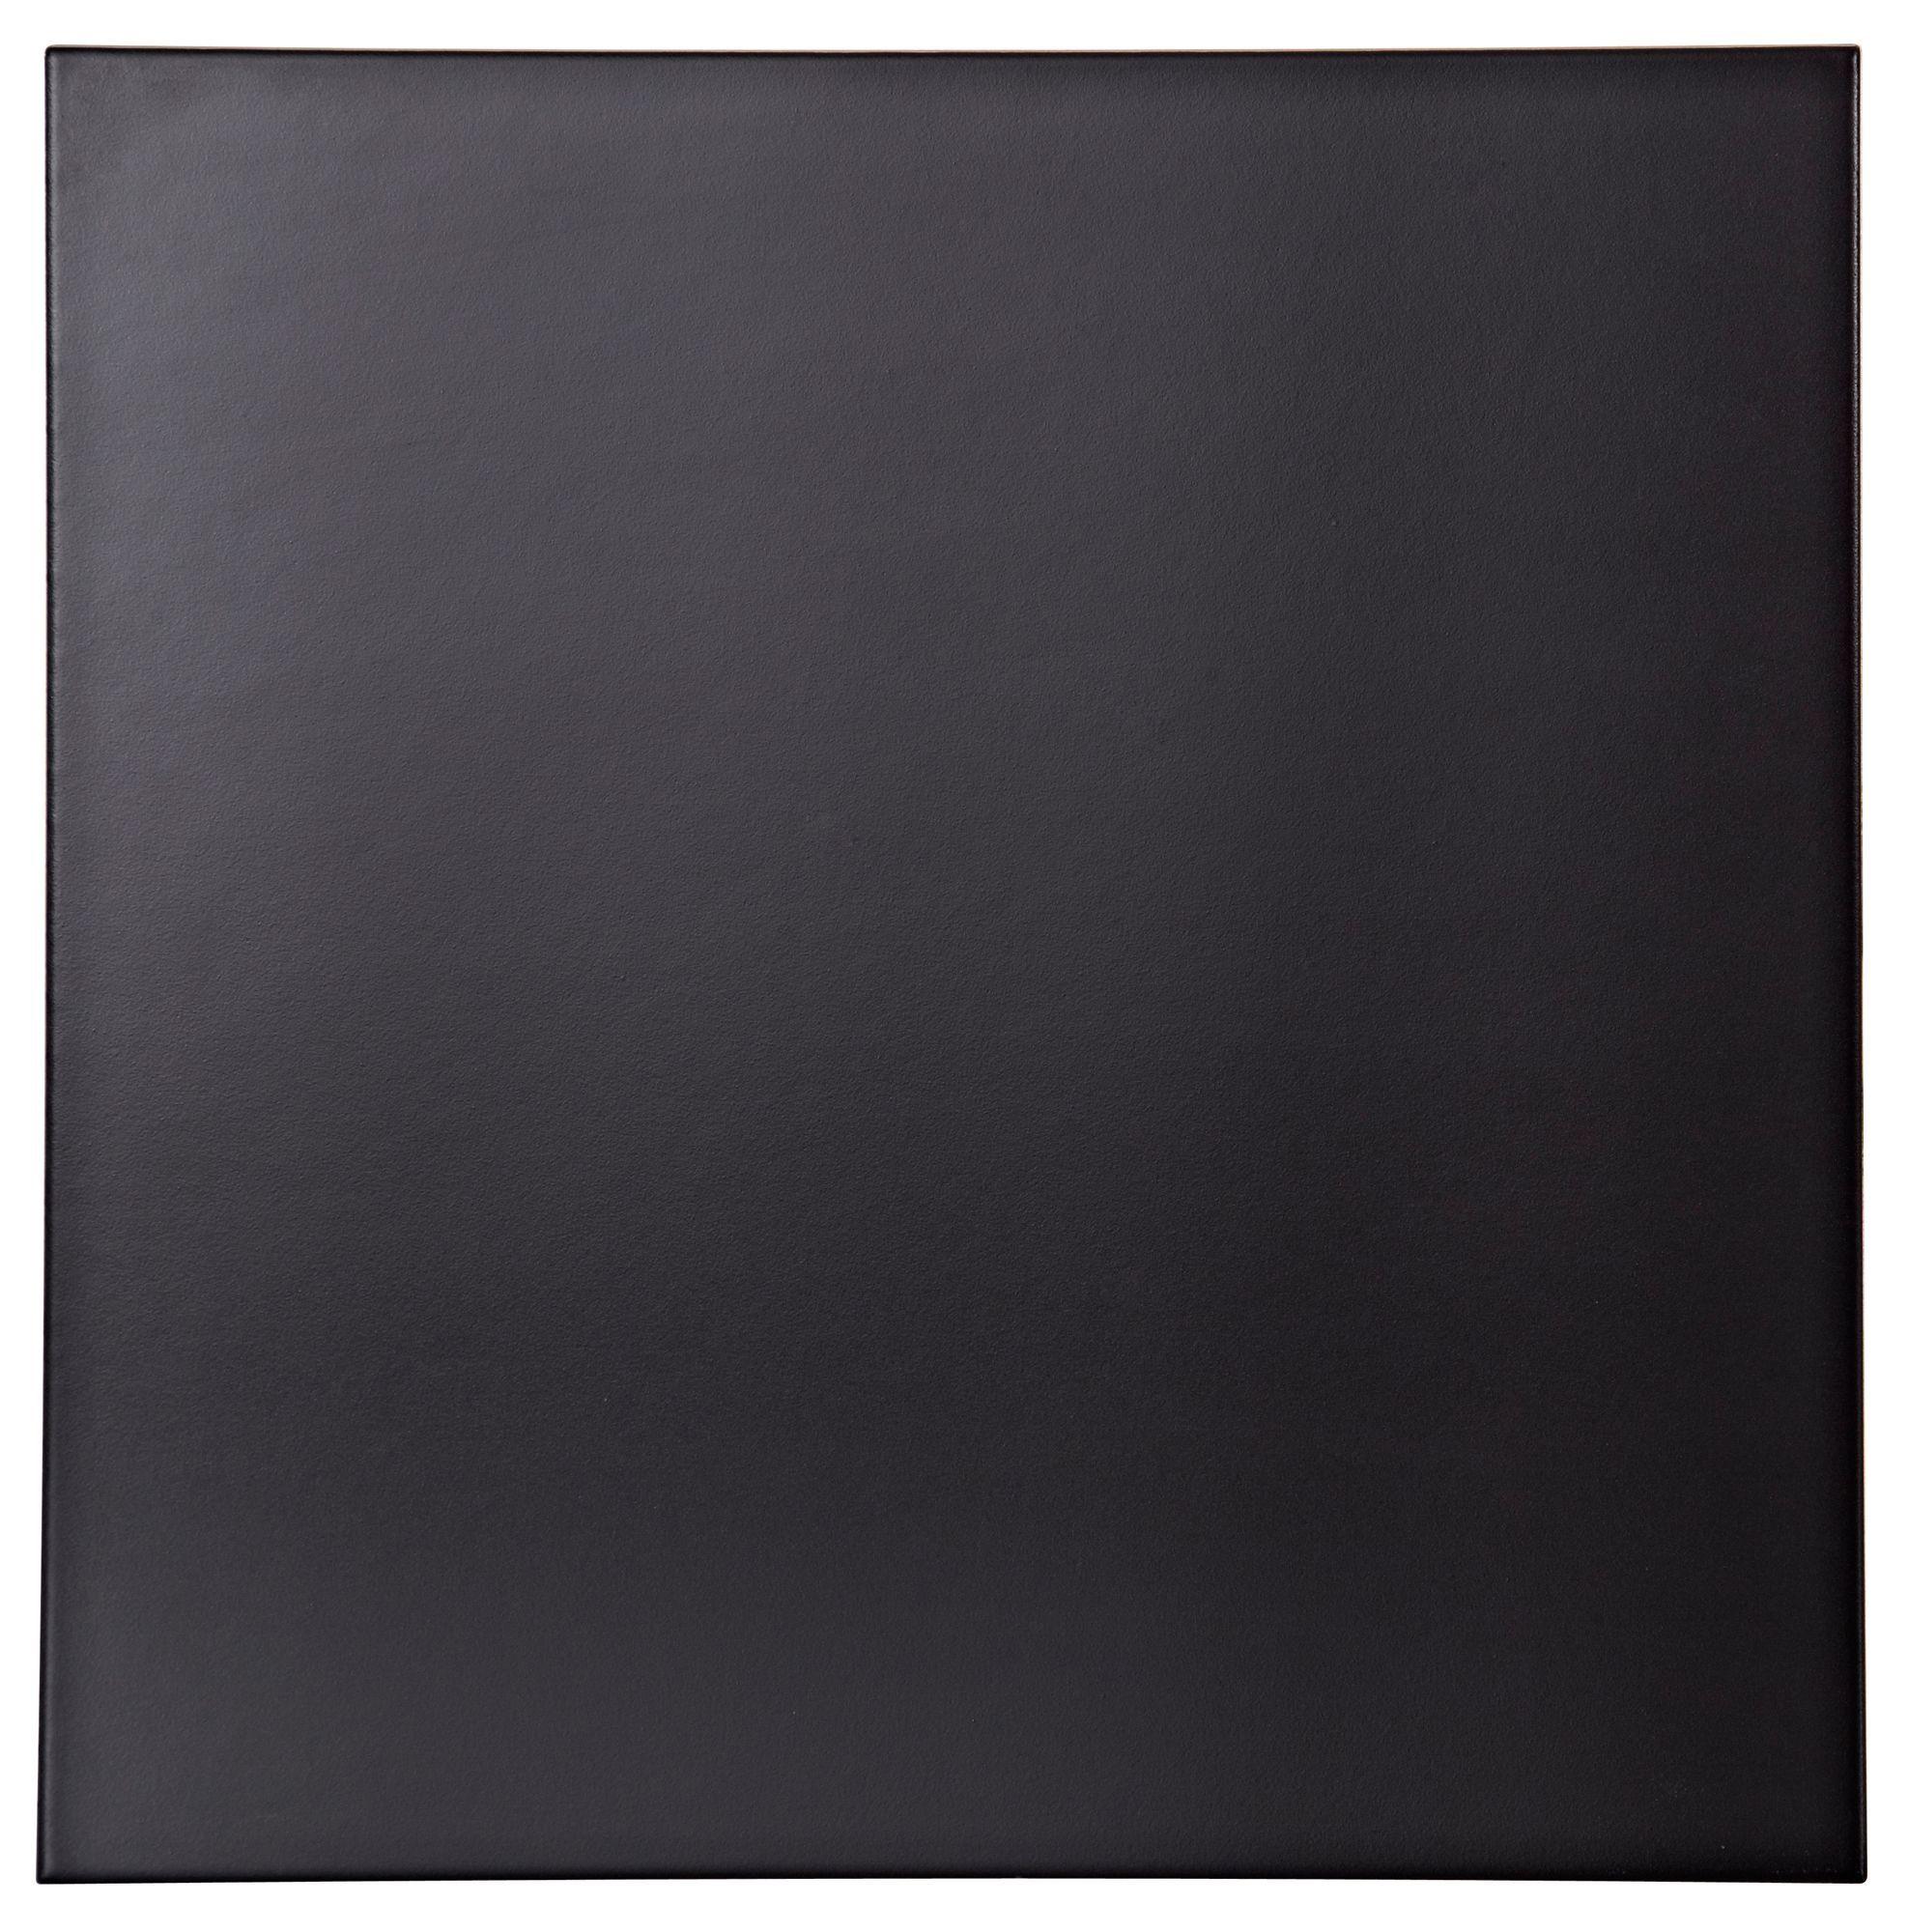 Colours umbria black porcelain floor tile pack of 9 l333mm w colours umbria black porcelain floor tile pack of 9 l333mm w dailygadgetfo Images